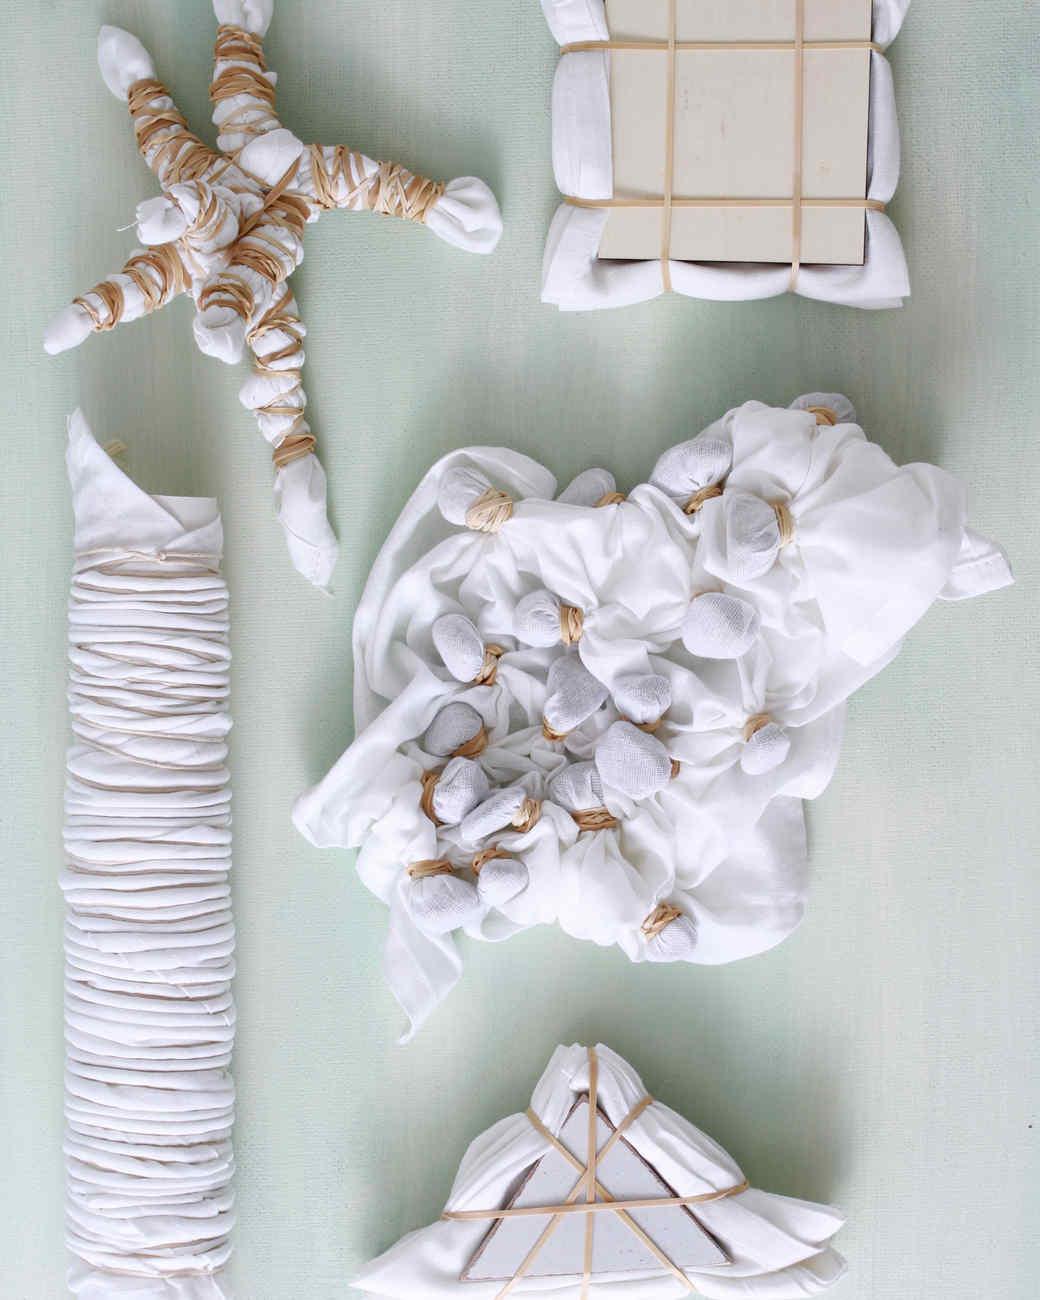 assortment of bundled fabrics